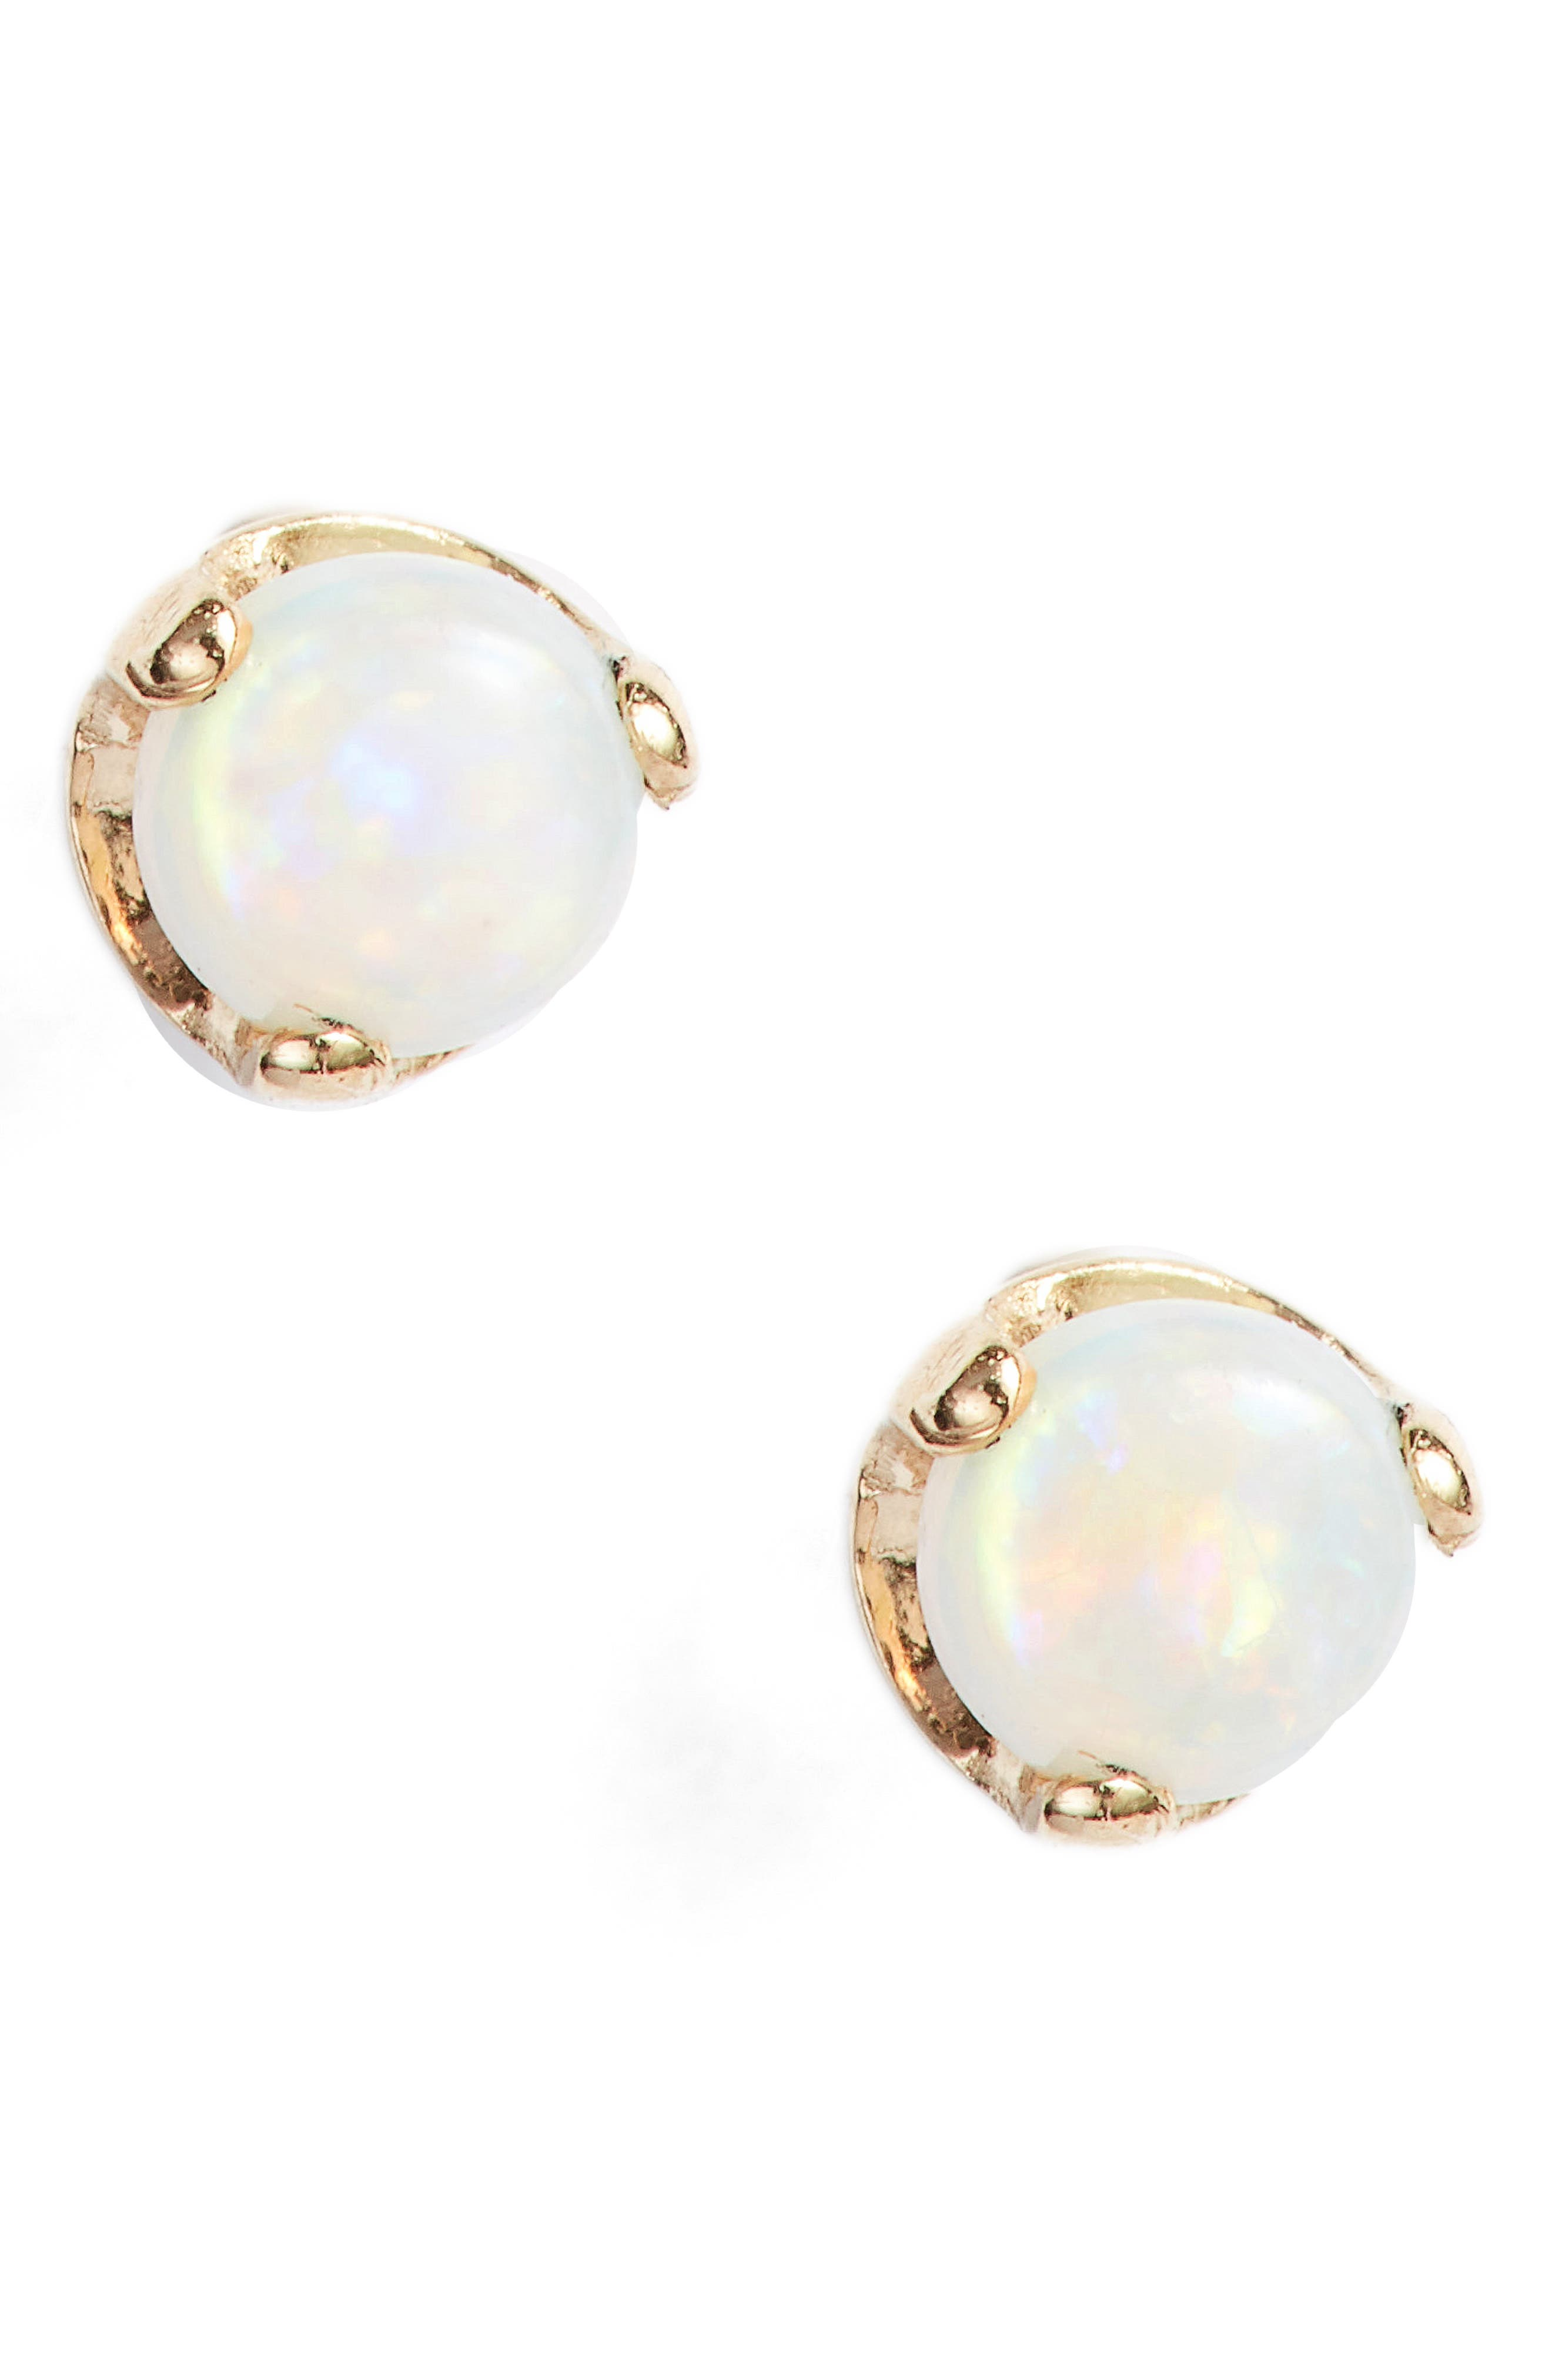 Opal Stud Earrings,                         Main,                         color, YELLOW GOLD/ OPAL